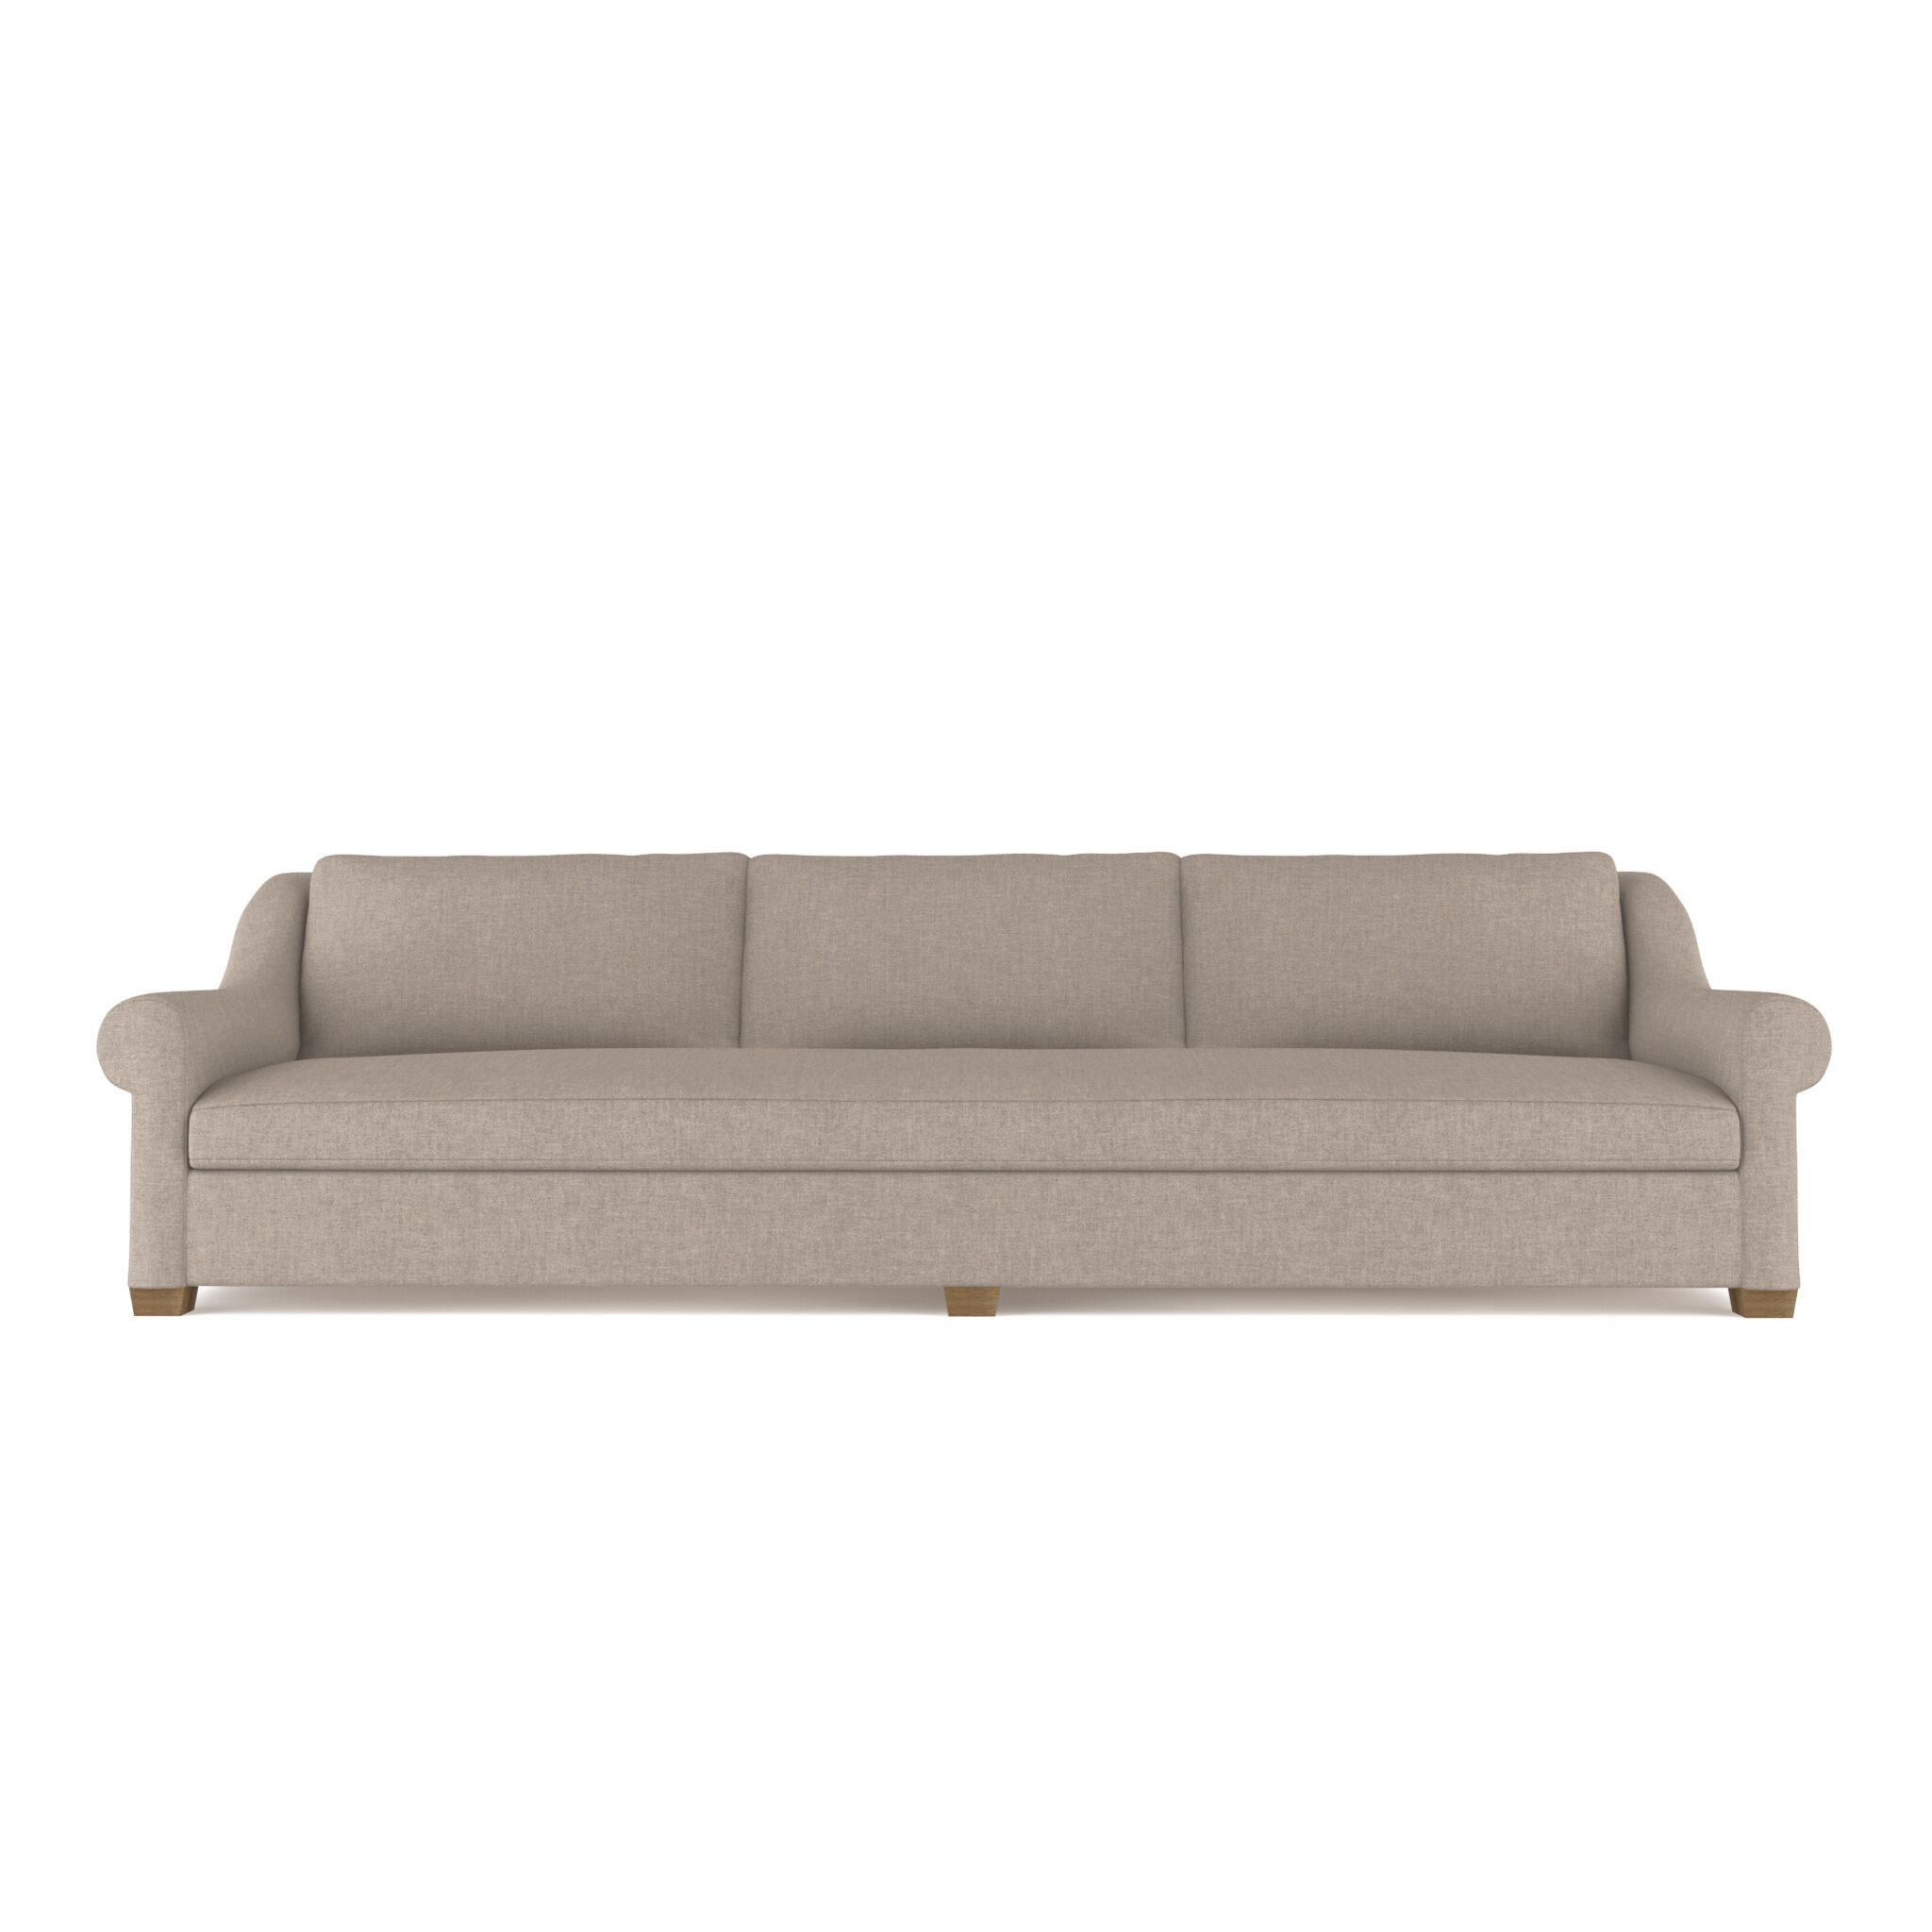 Auberge Sofa Upholstery: Sandstone, Size: 32